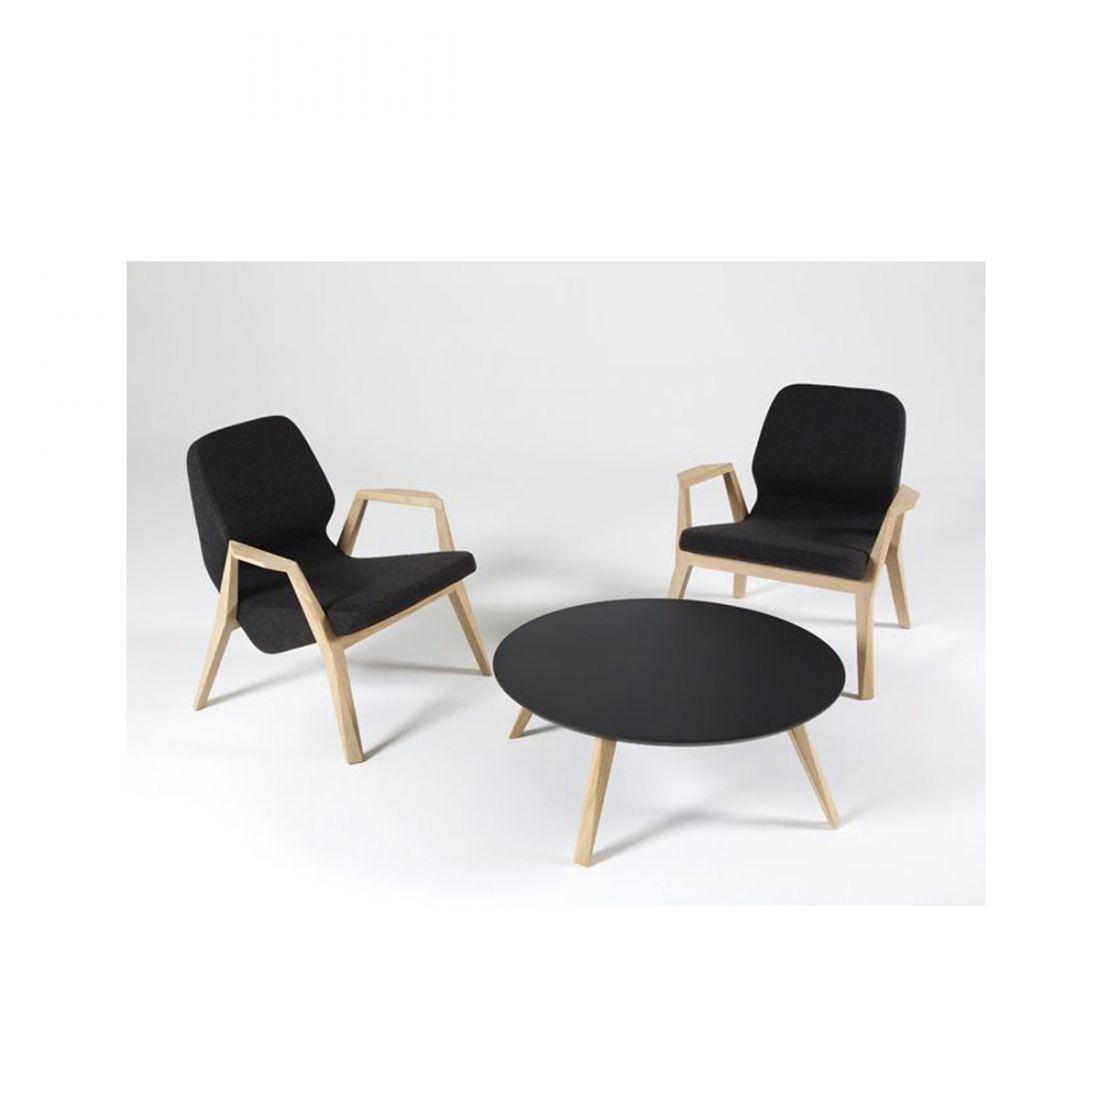 Fauteuil bas design Oblique PROSTORIA Zendart Design